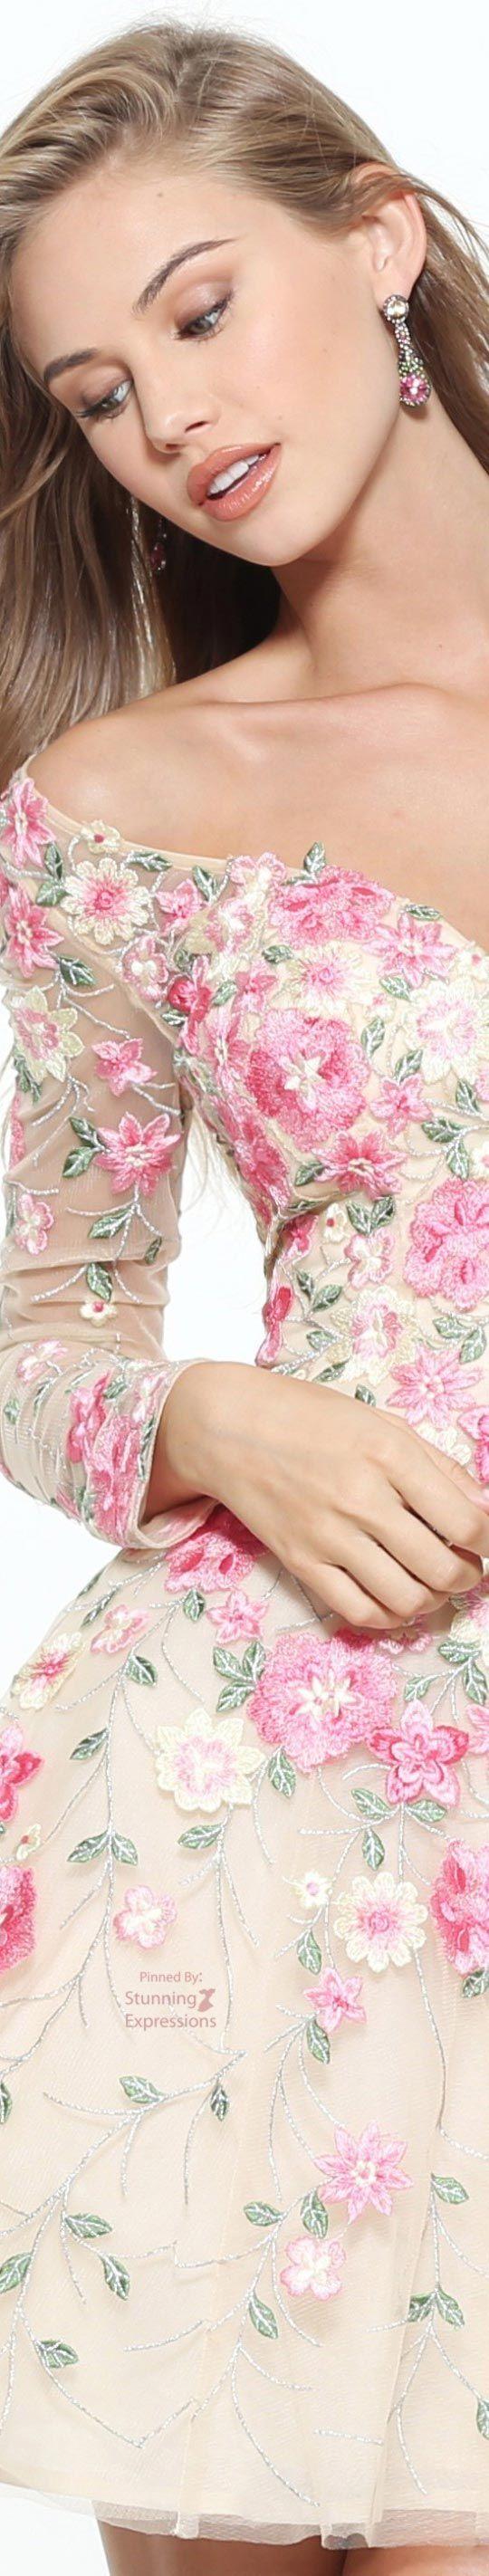 she wears roses...